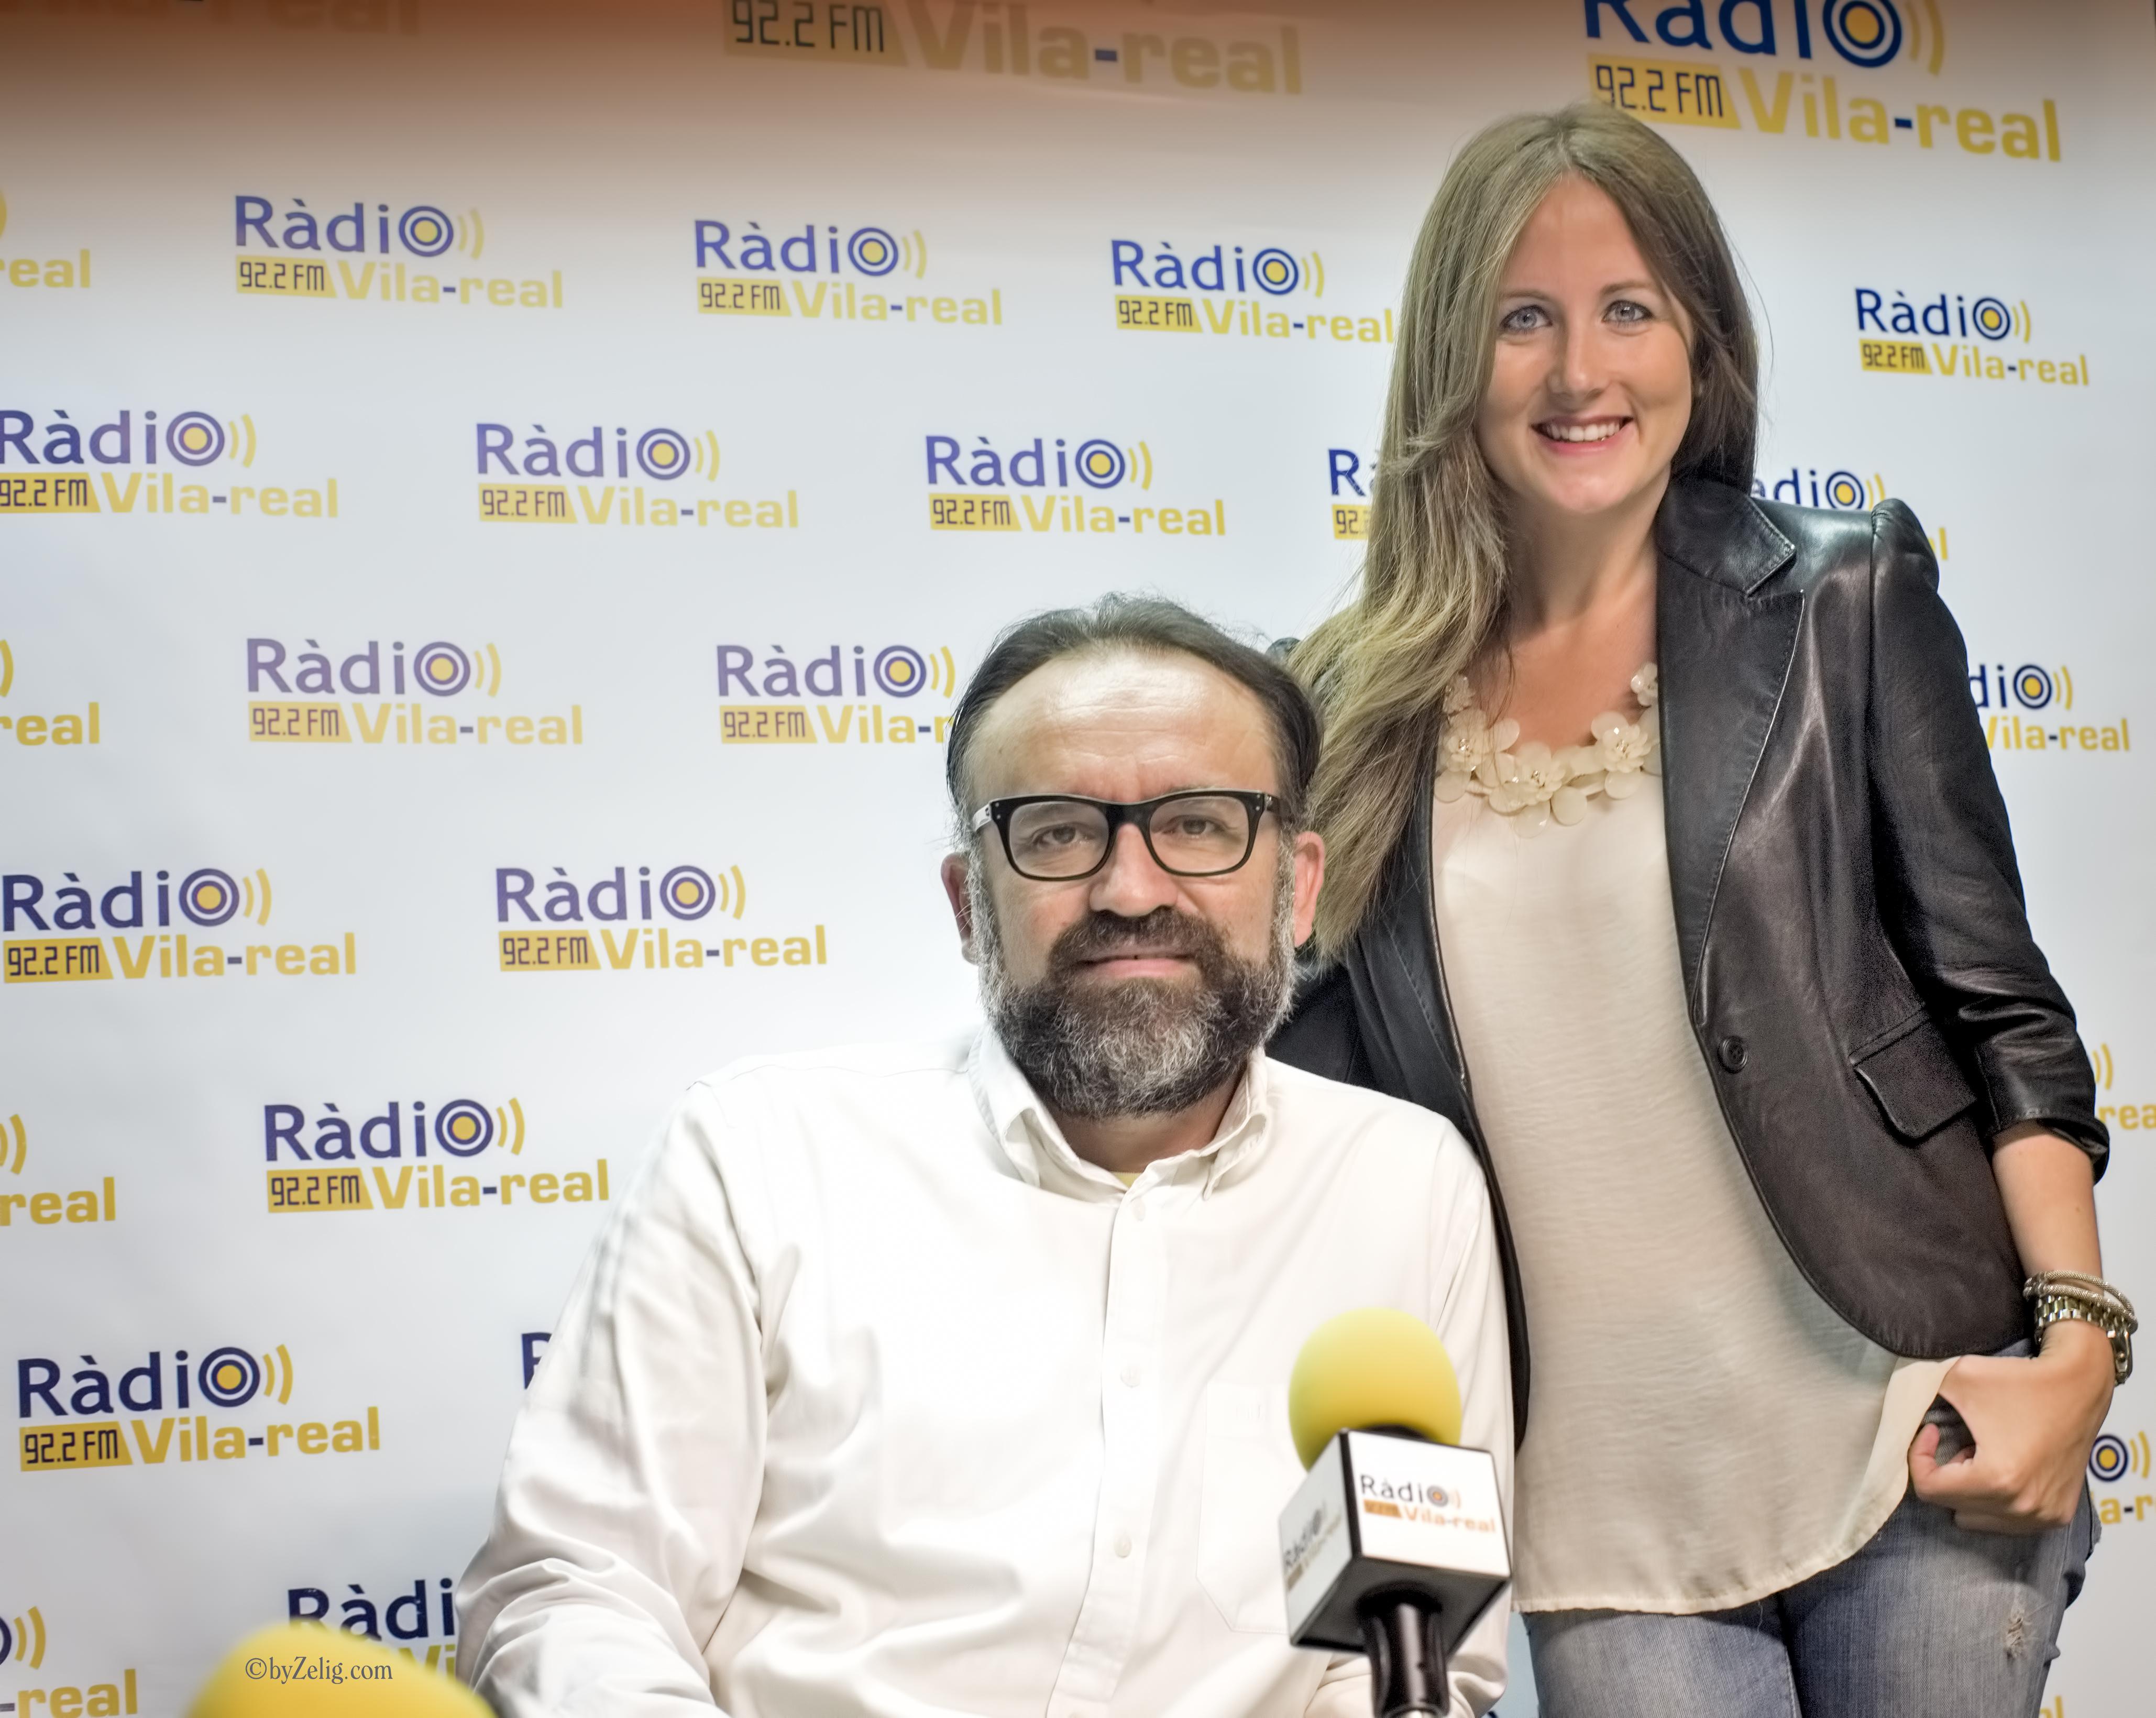 Esports Radio Vila-real. Programa del 6 de febrero de 2017